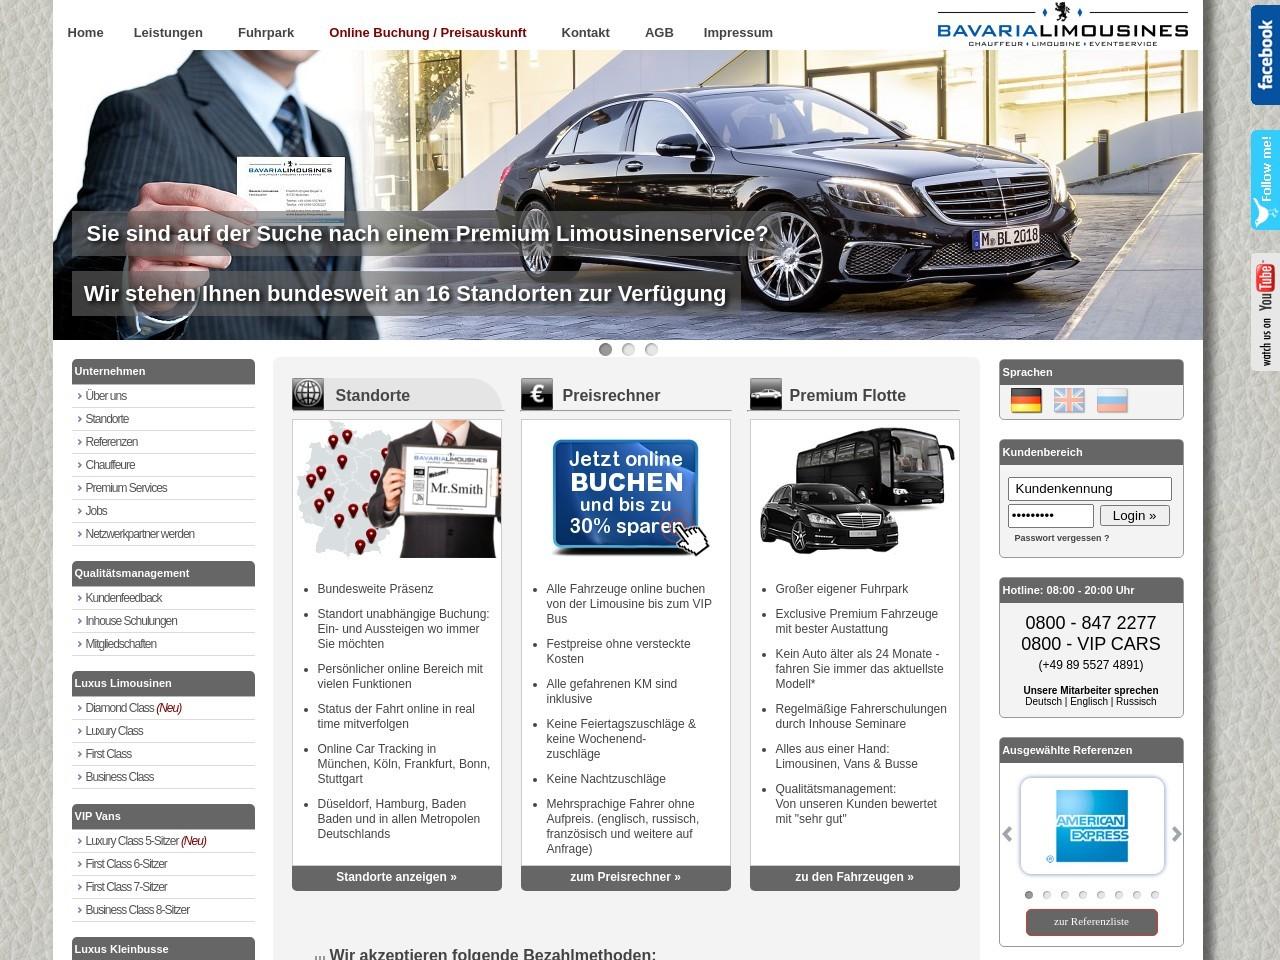 Bavaria Limousines